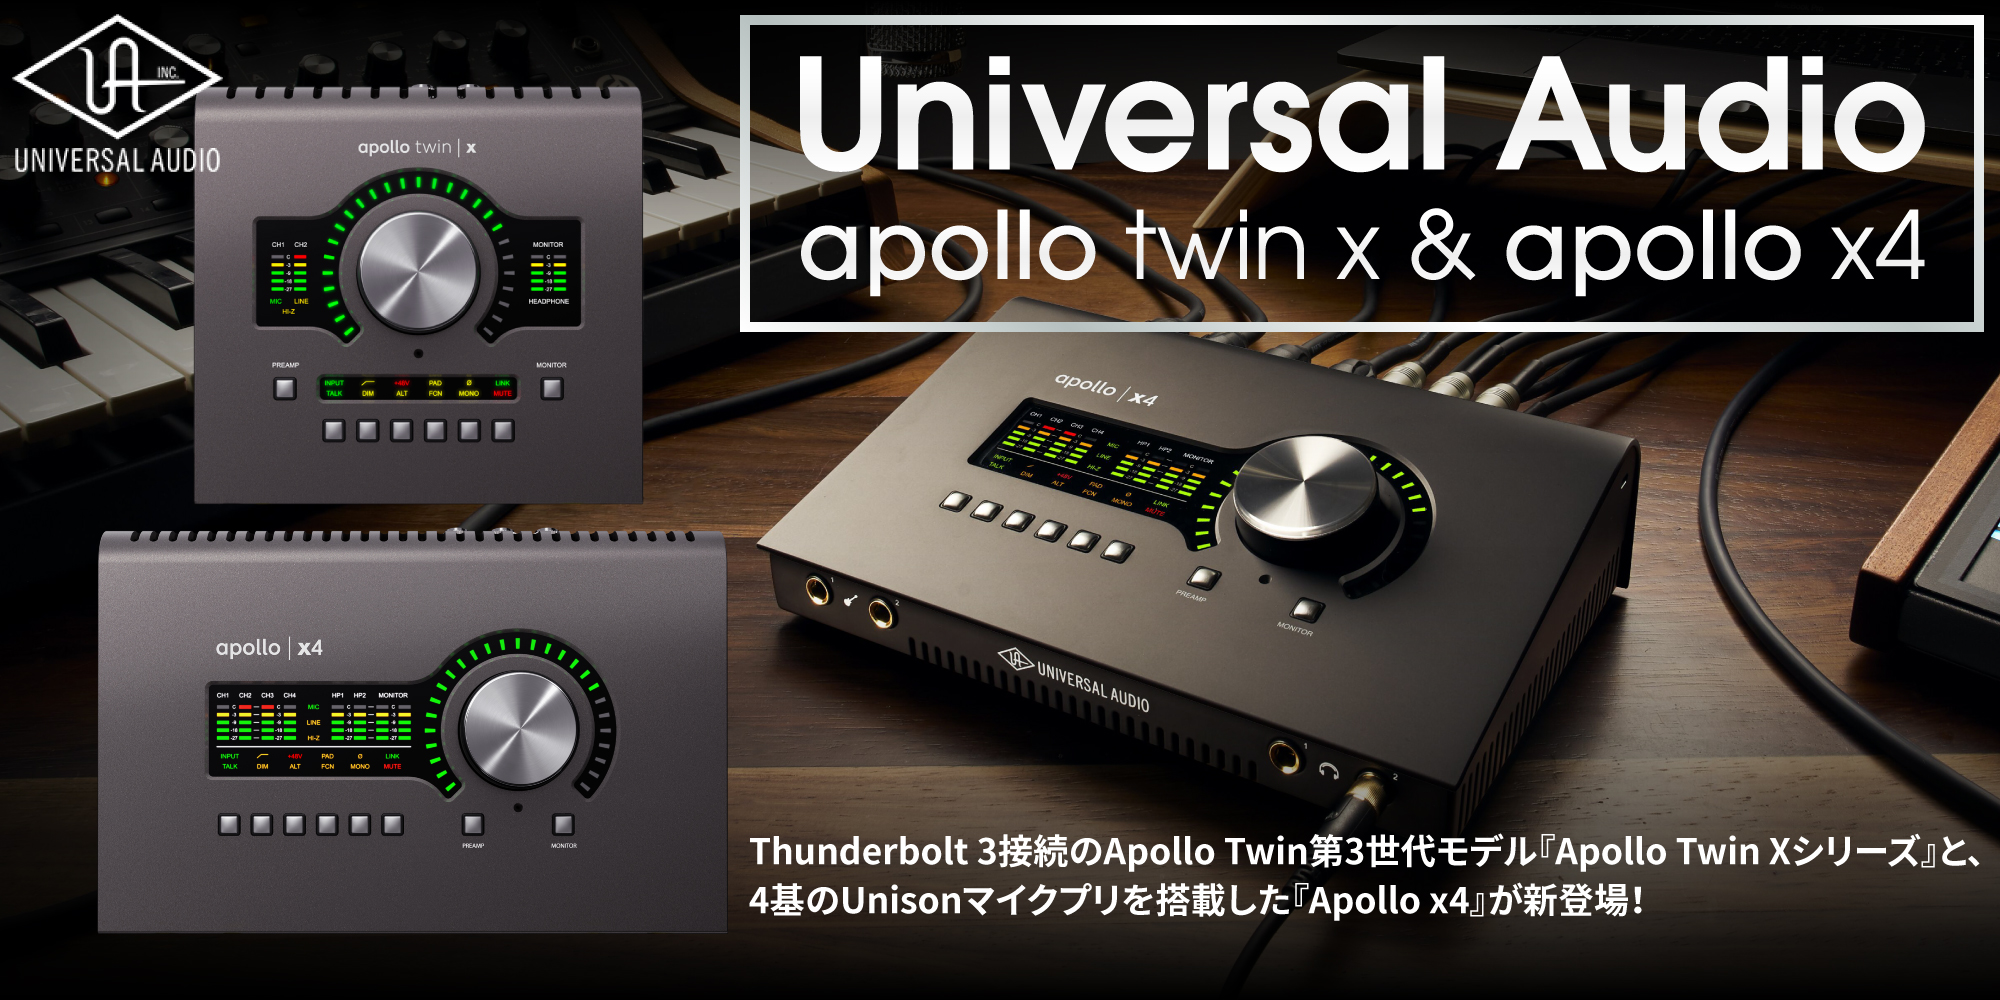 Thunderbolt 3接続のApollo Twin第3世代モデル『Apollo Twin Xシリーズ』と、4基のUnisonマイクプリを搭載した『Apollo x4』が新登場!